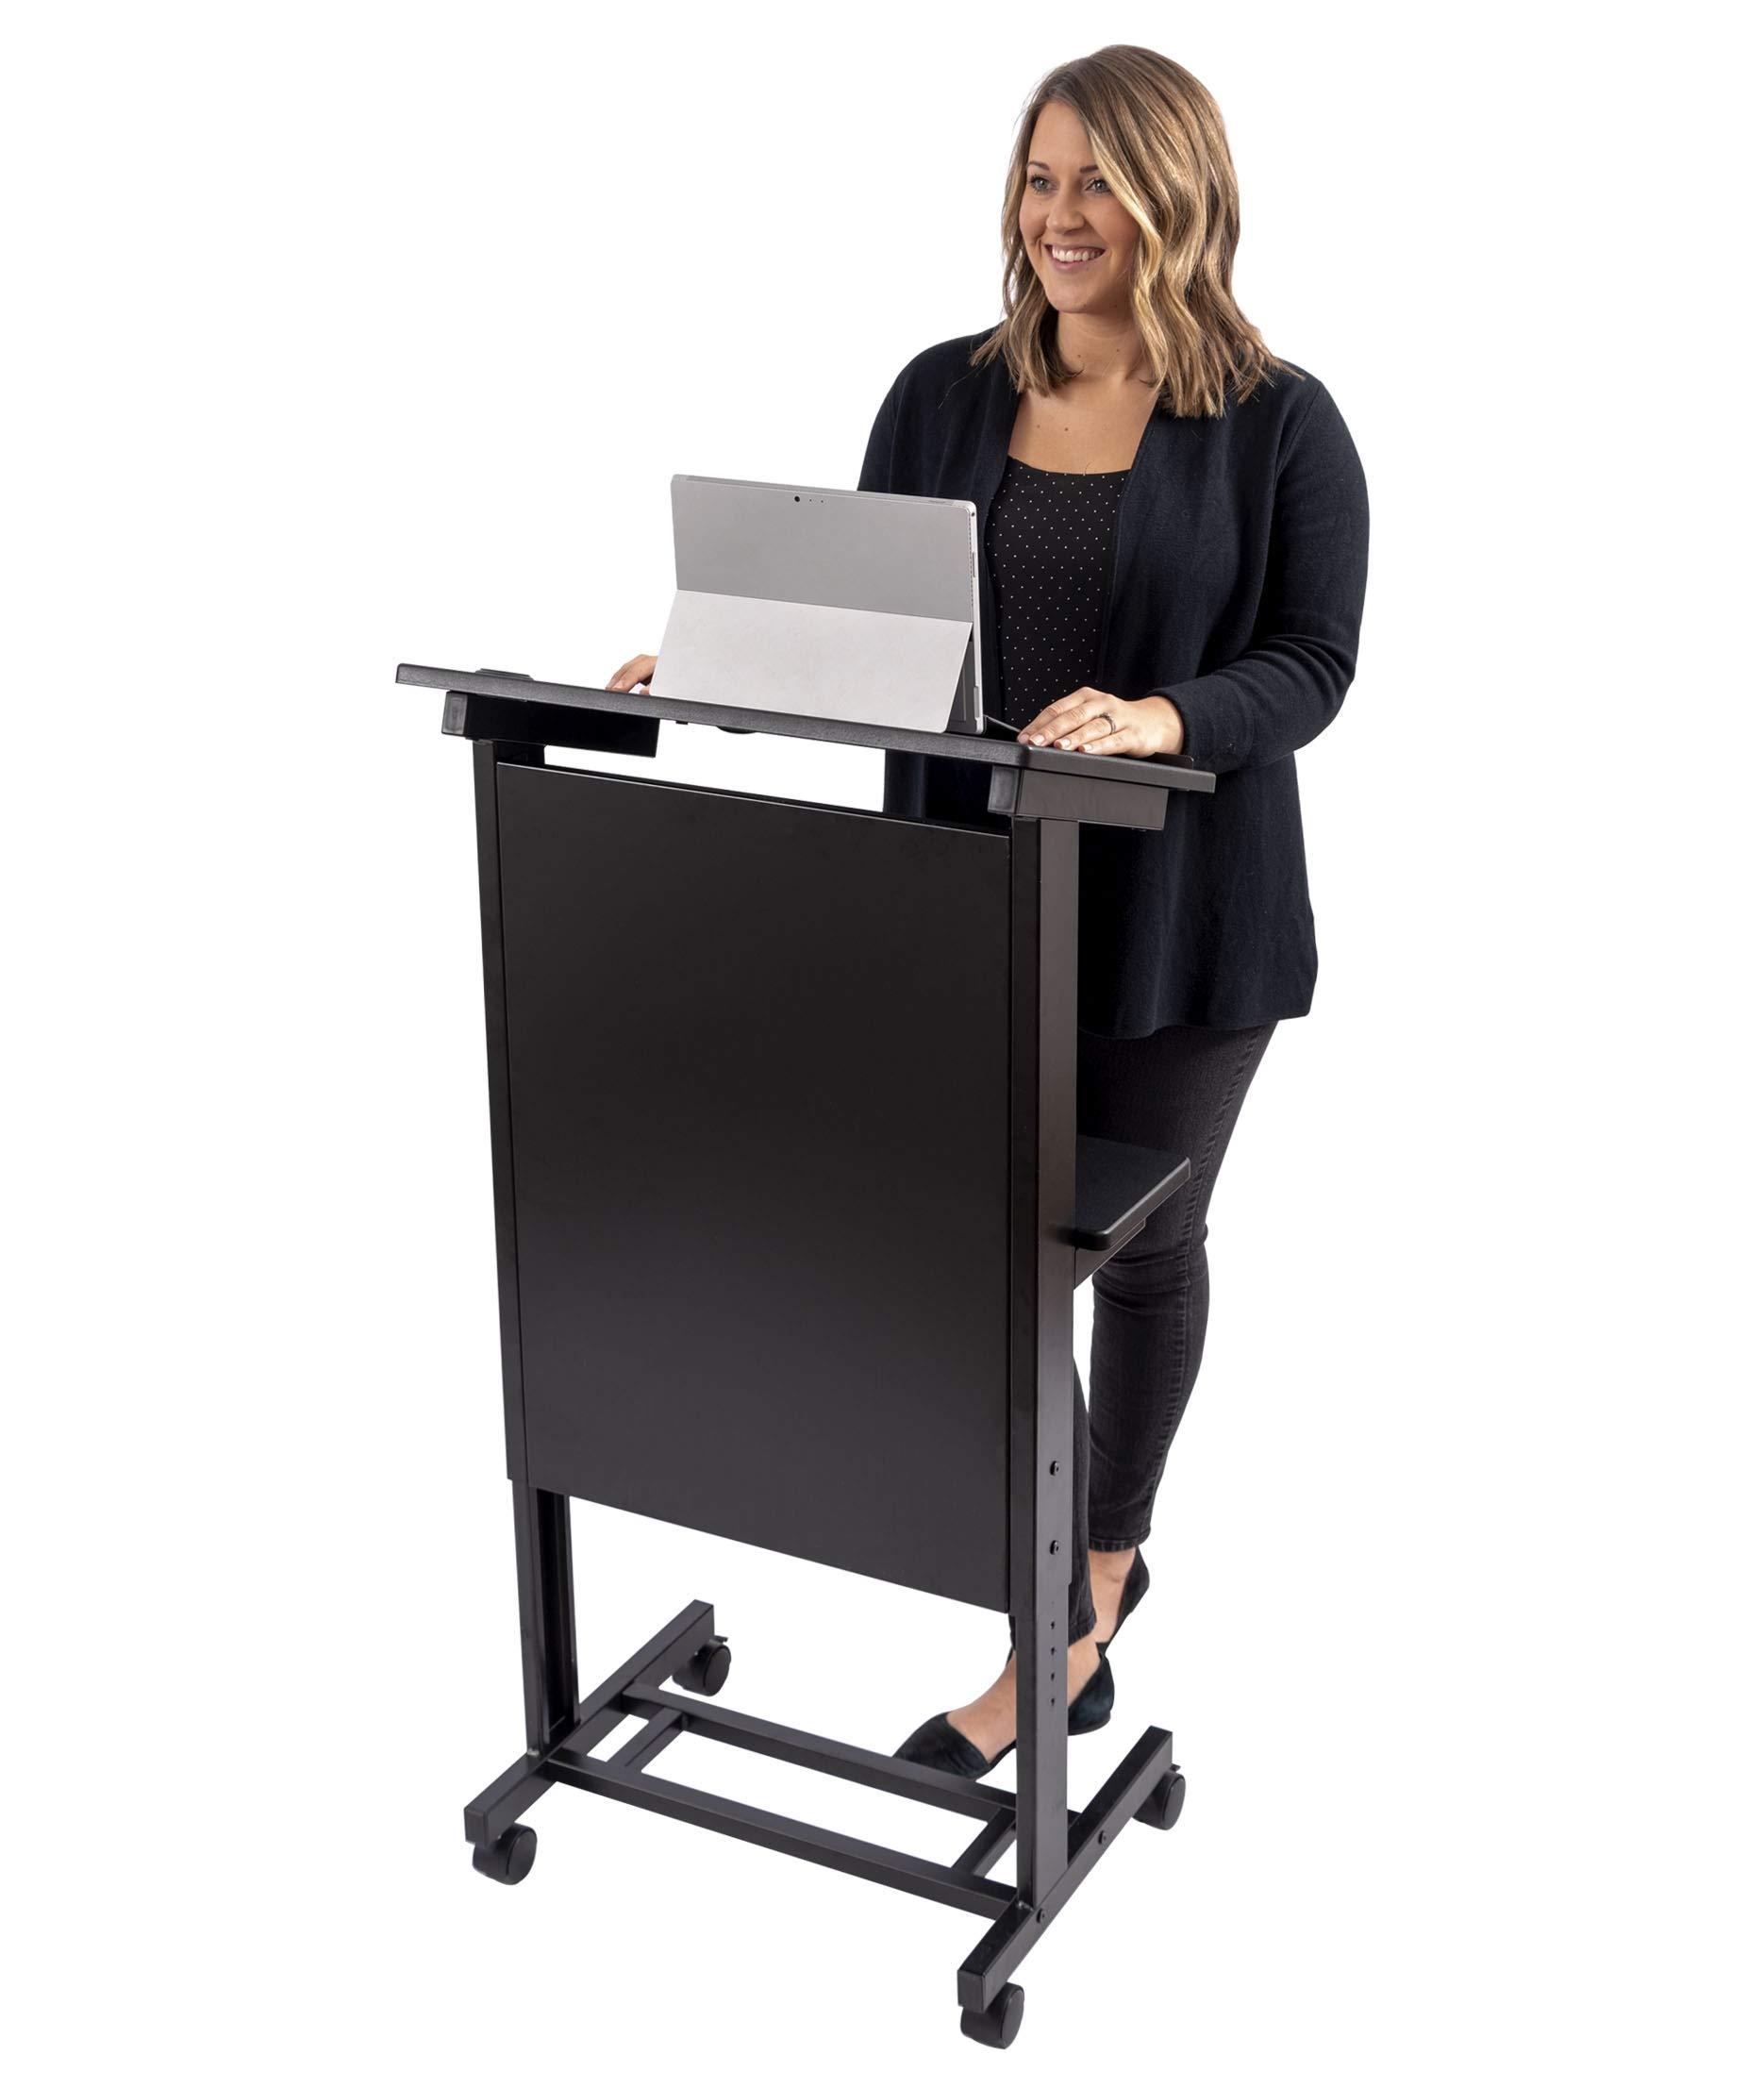 Stand Up Desk Store Adjustable